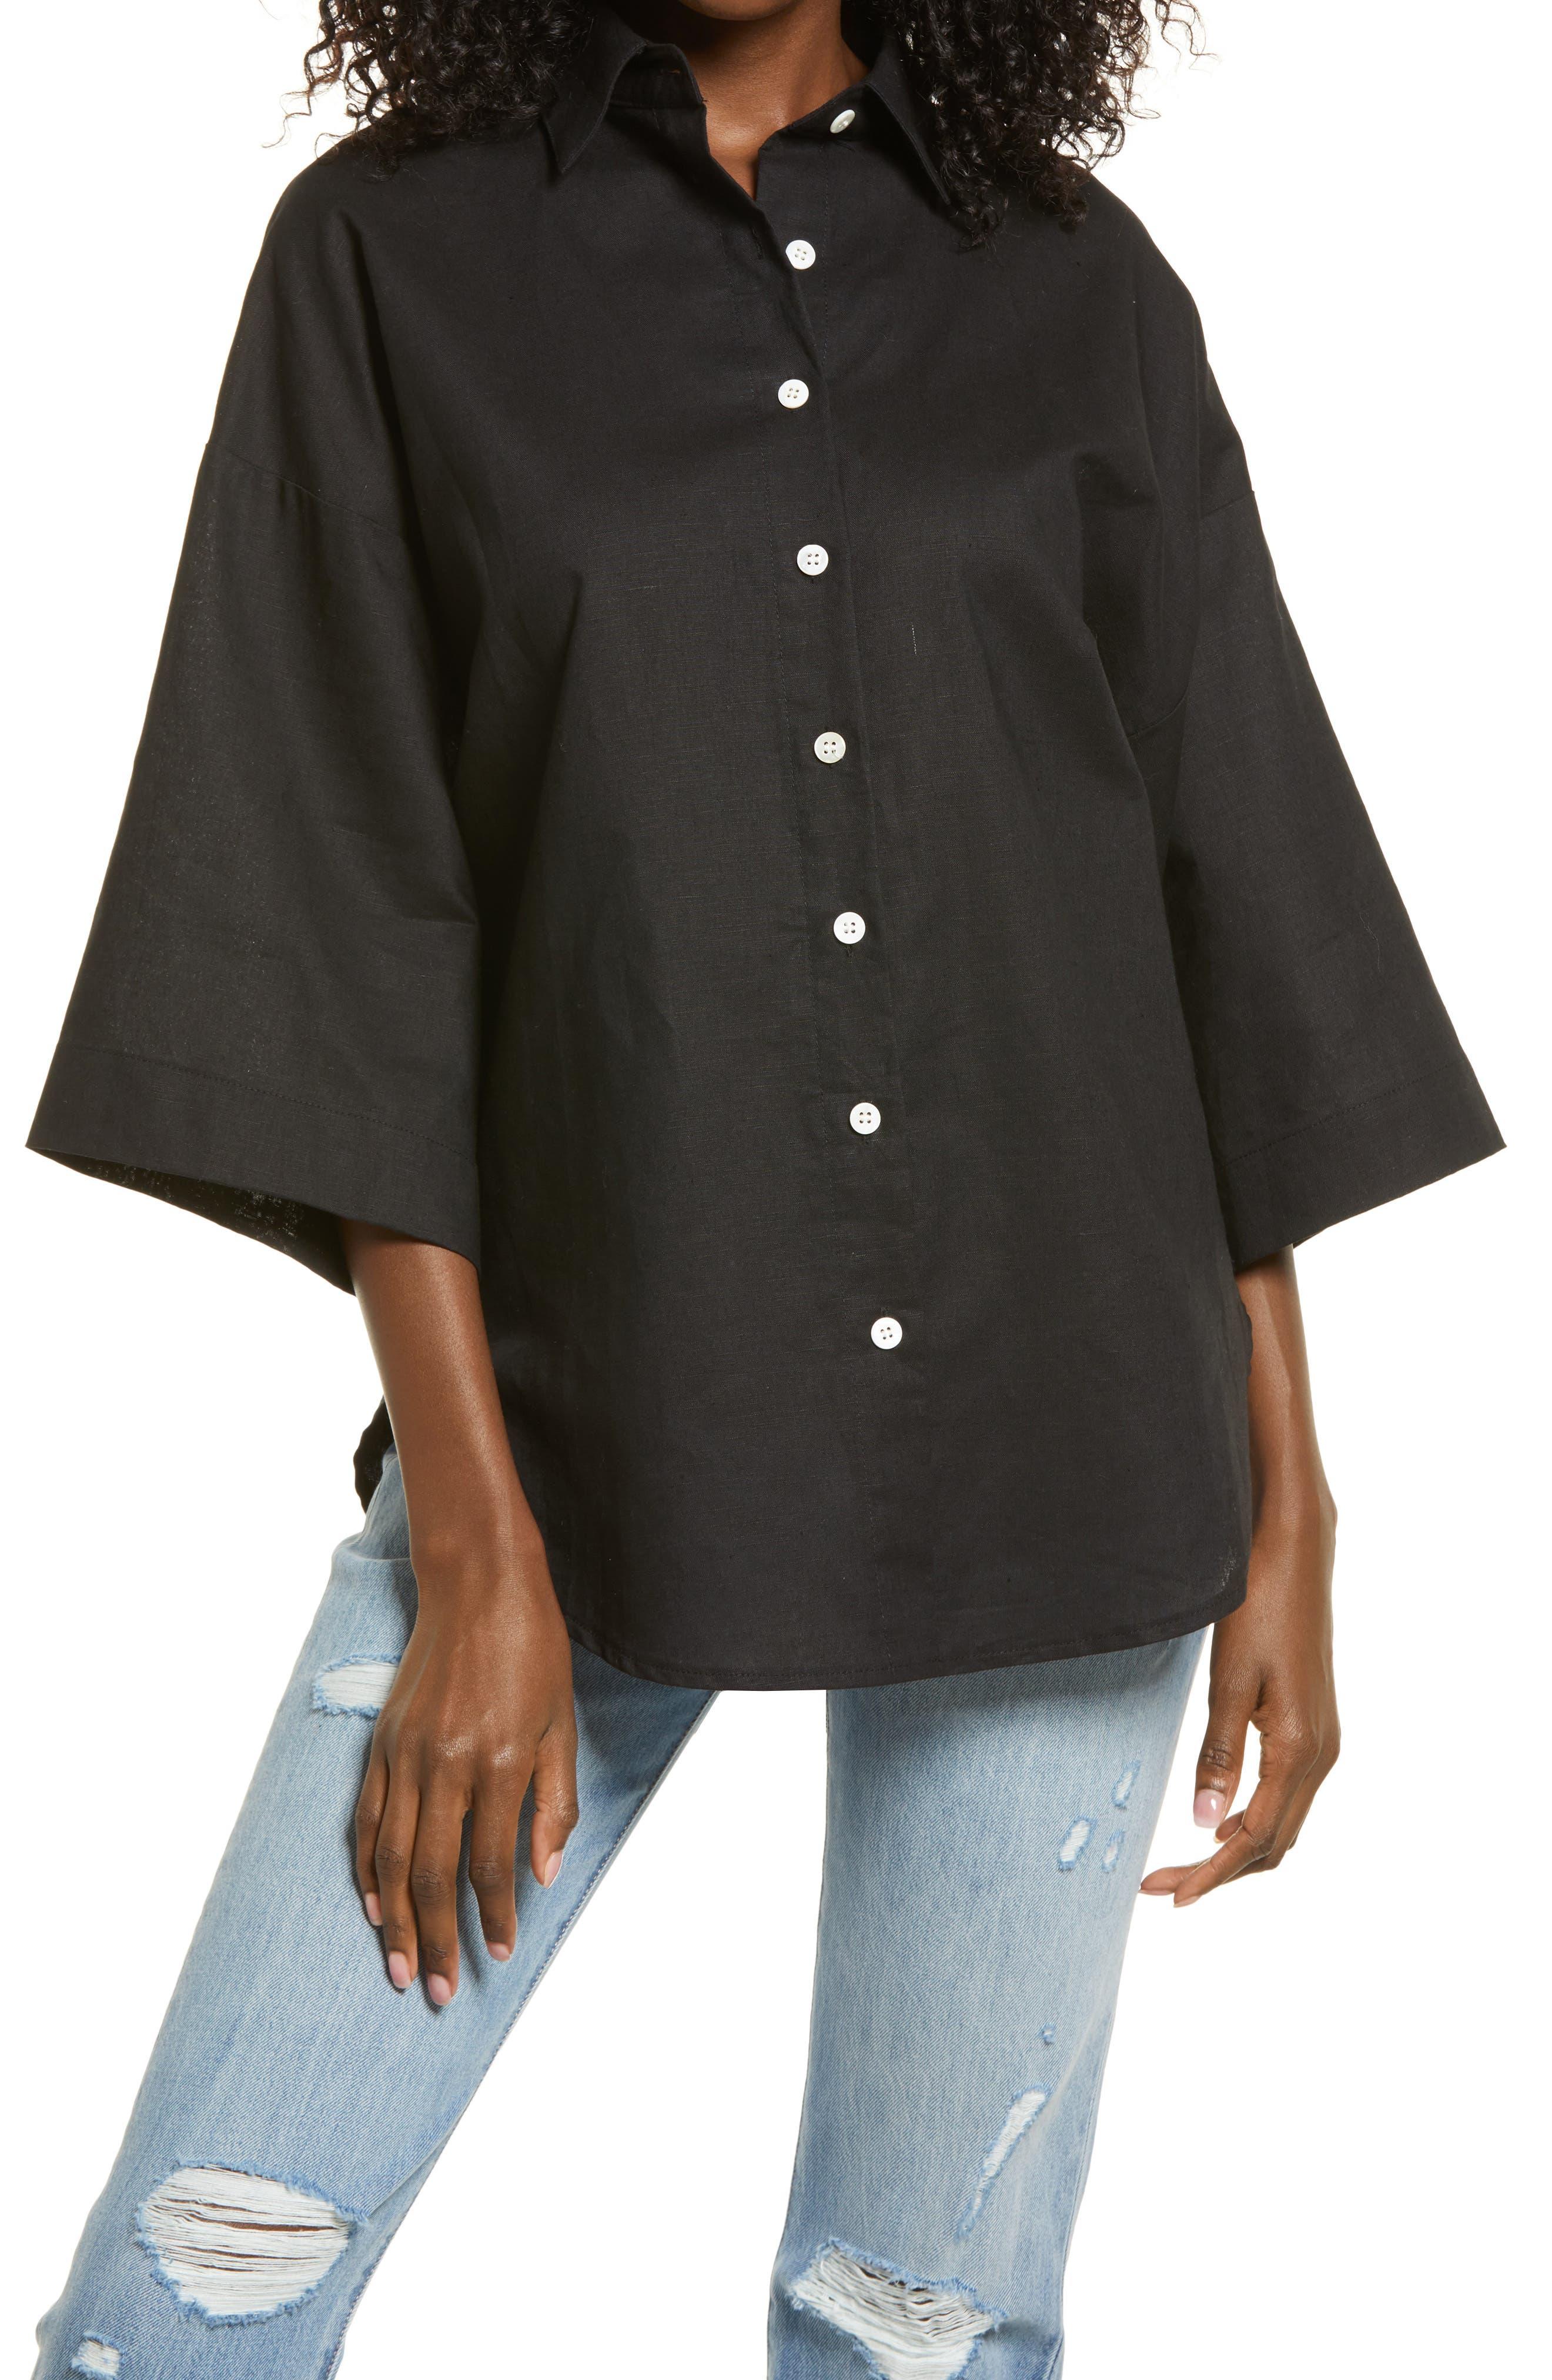 Harlow Oversize Shirt